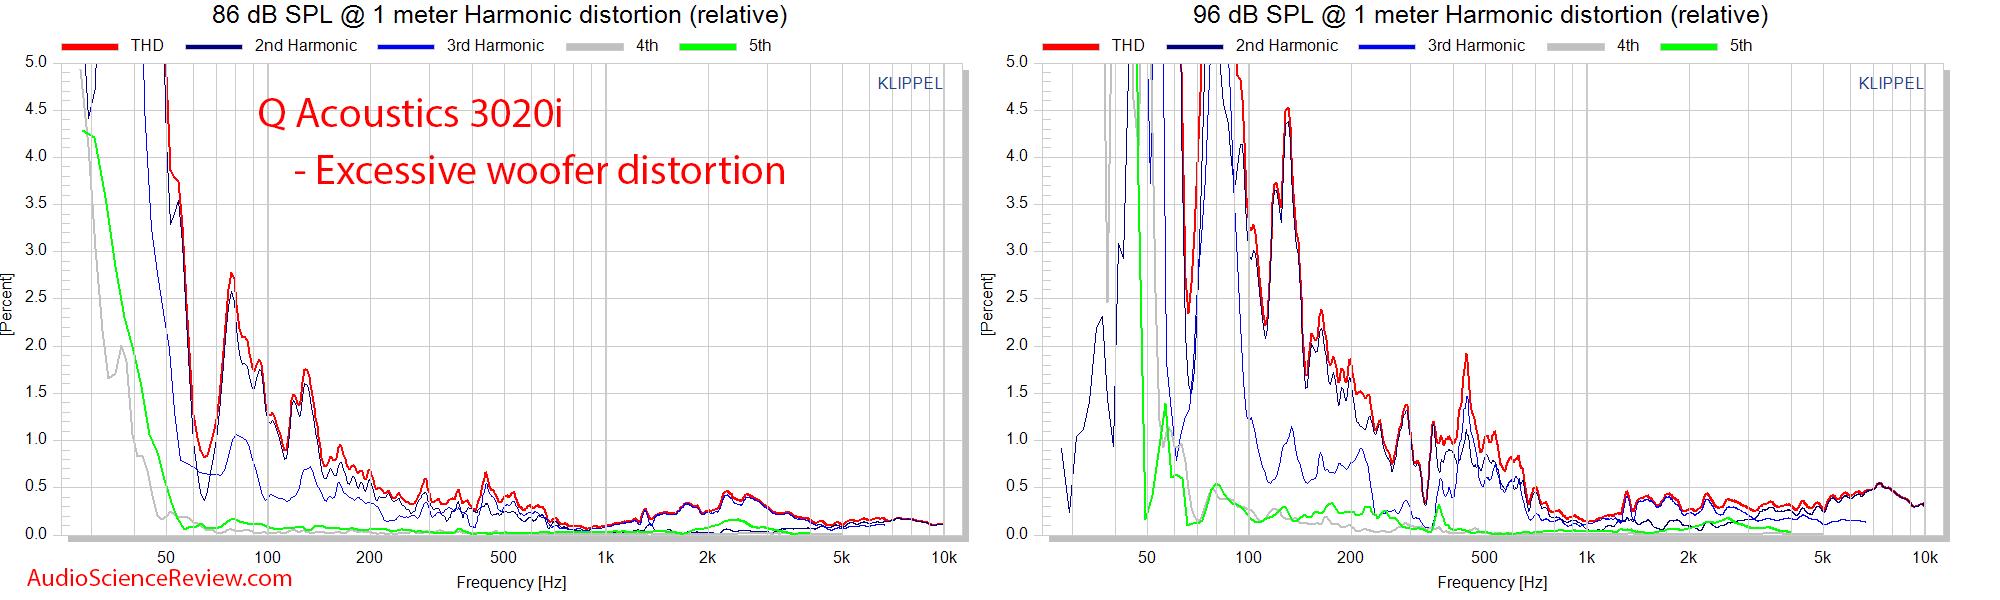 Q Acoustics 3020i Bookshelf speaker relative distortion THD measurements.png